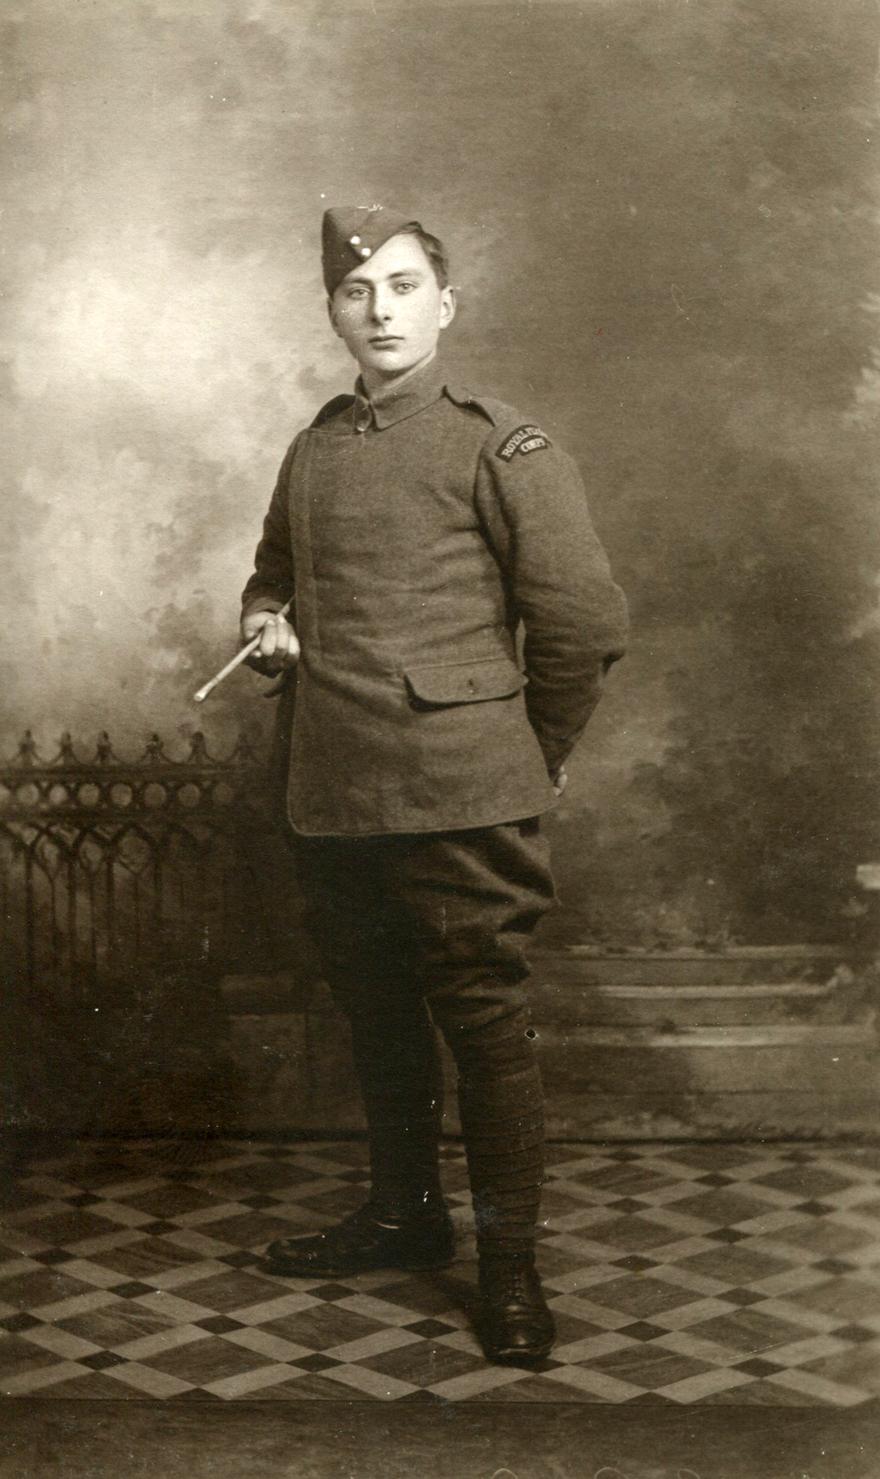 Studio Portrait Royal Flying Corps Serviceman c.1917